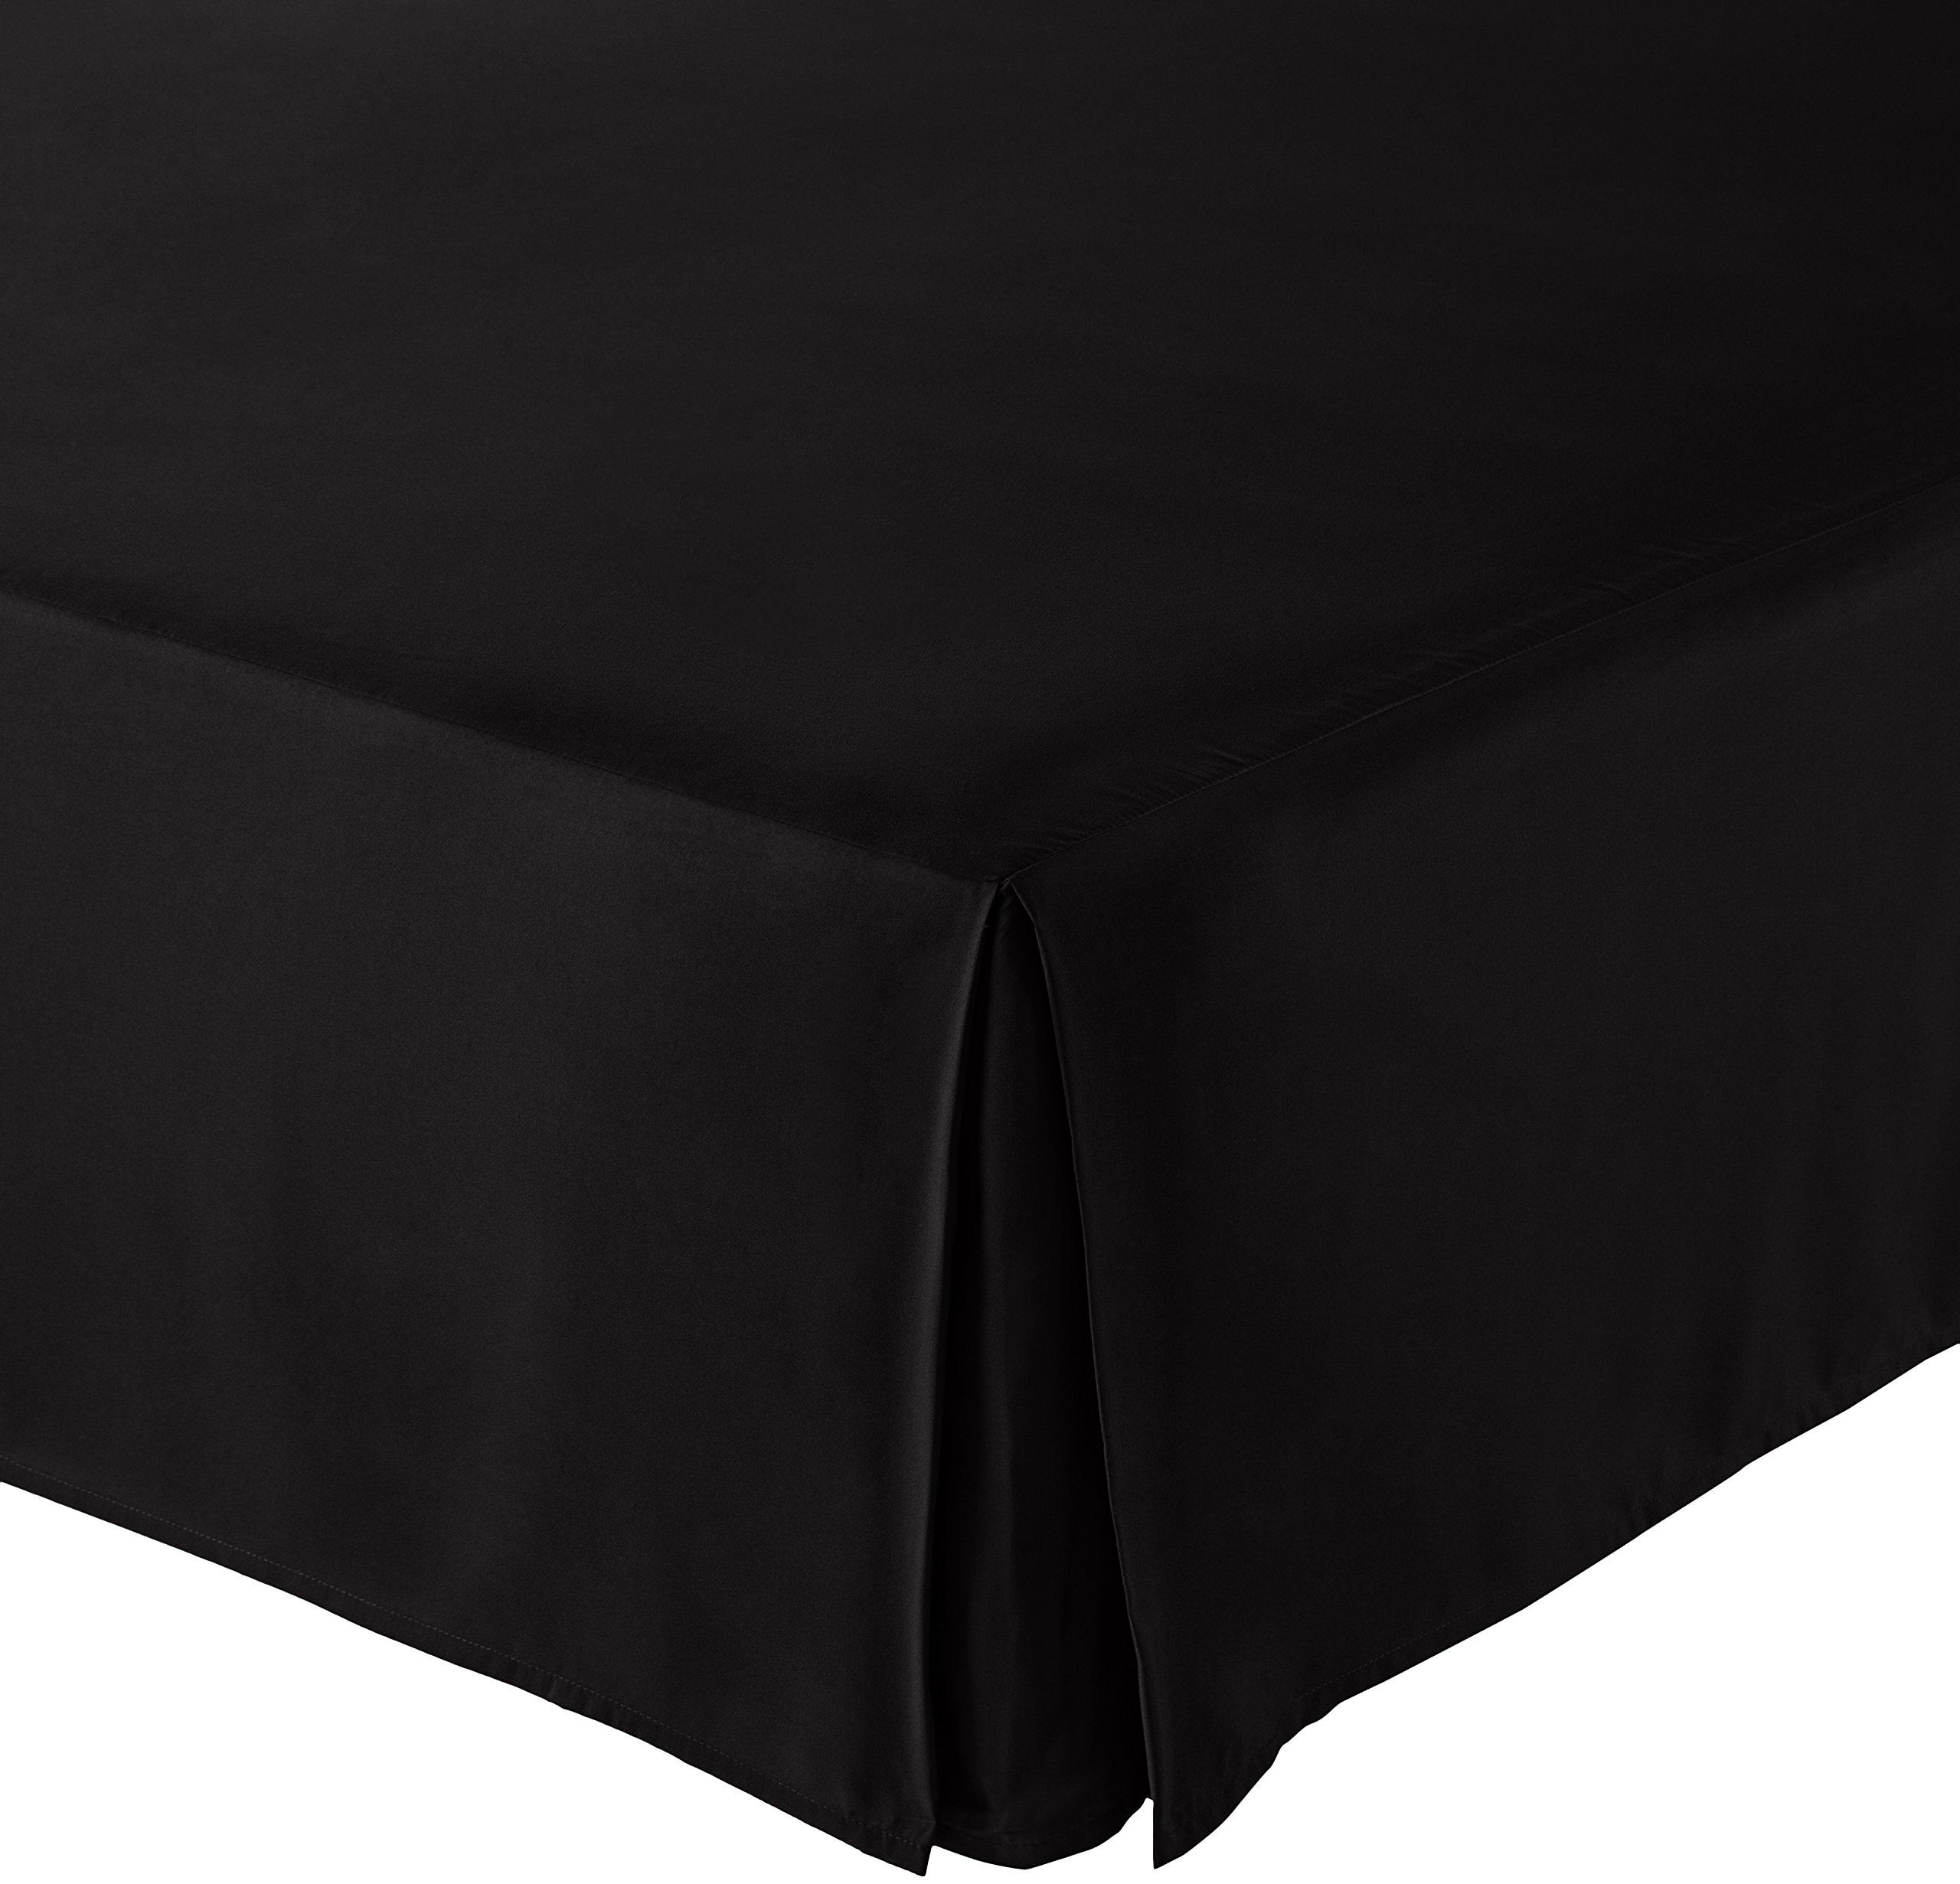 AmazonBasics Pleated Bed Skirt - Queen, Black